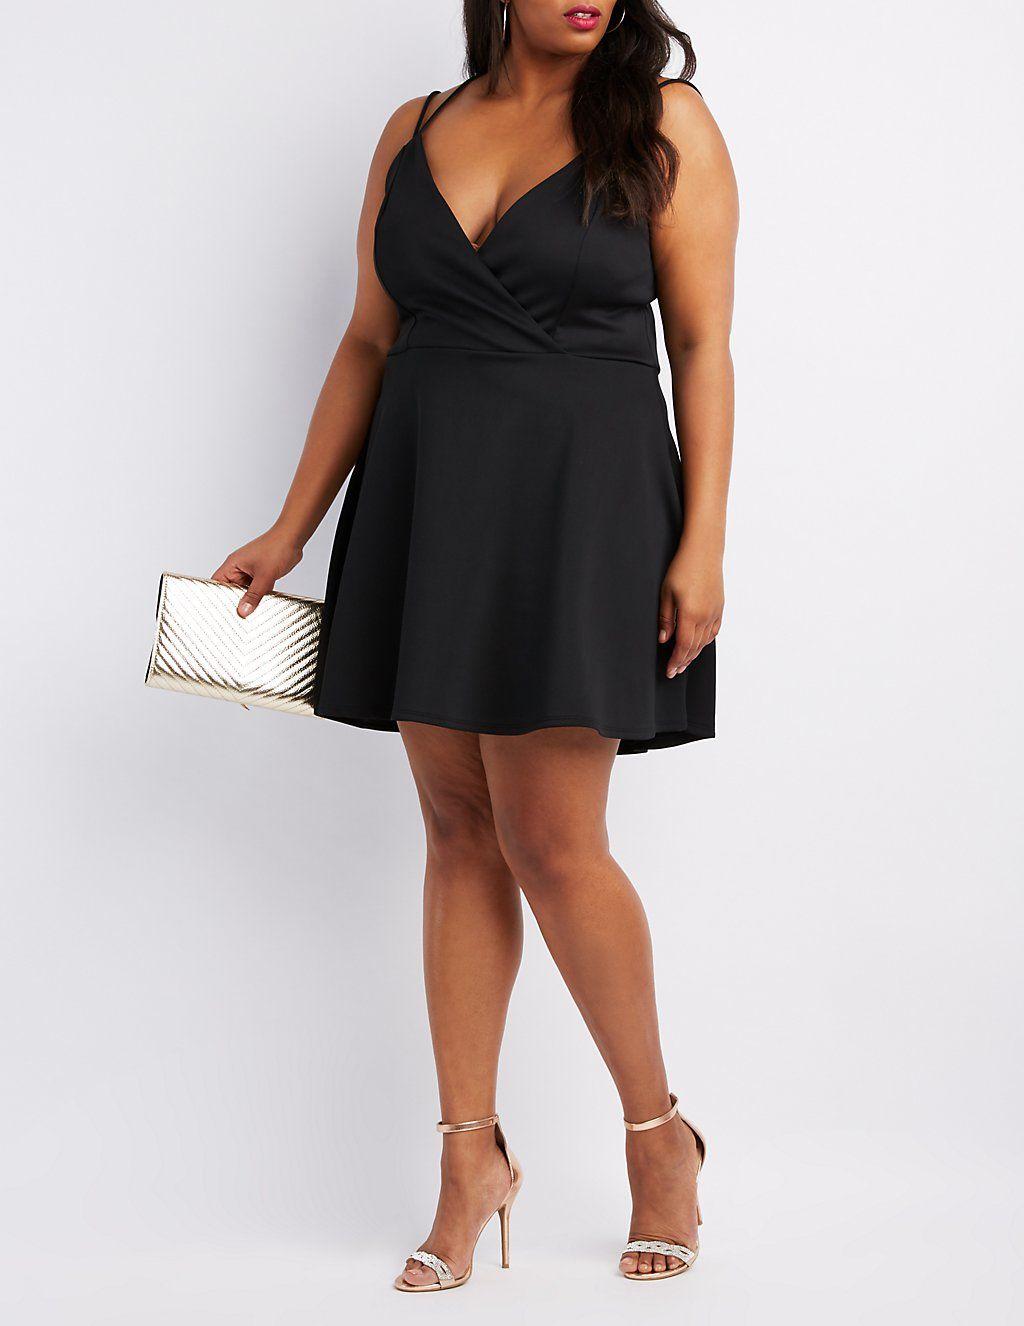 81e75062d2a Plus Size Strappy Back Surplice Skater Dress